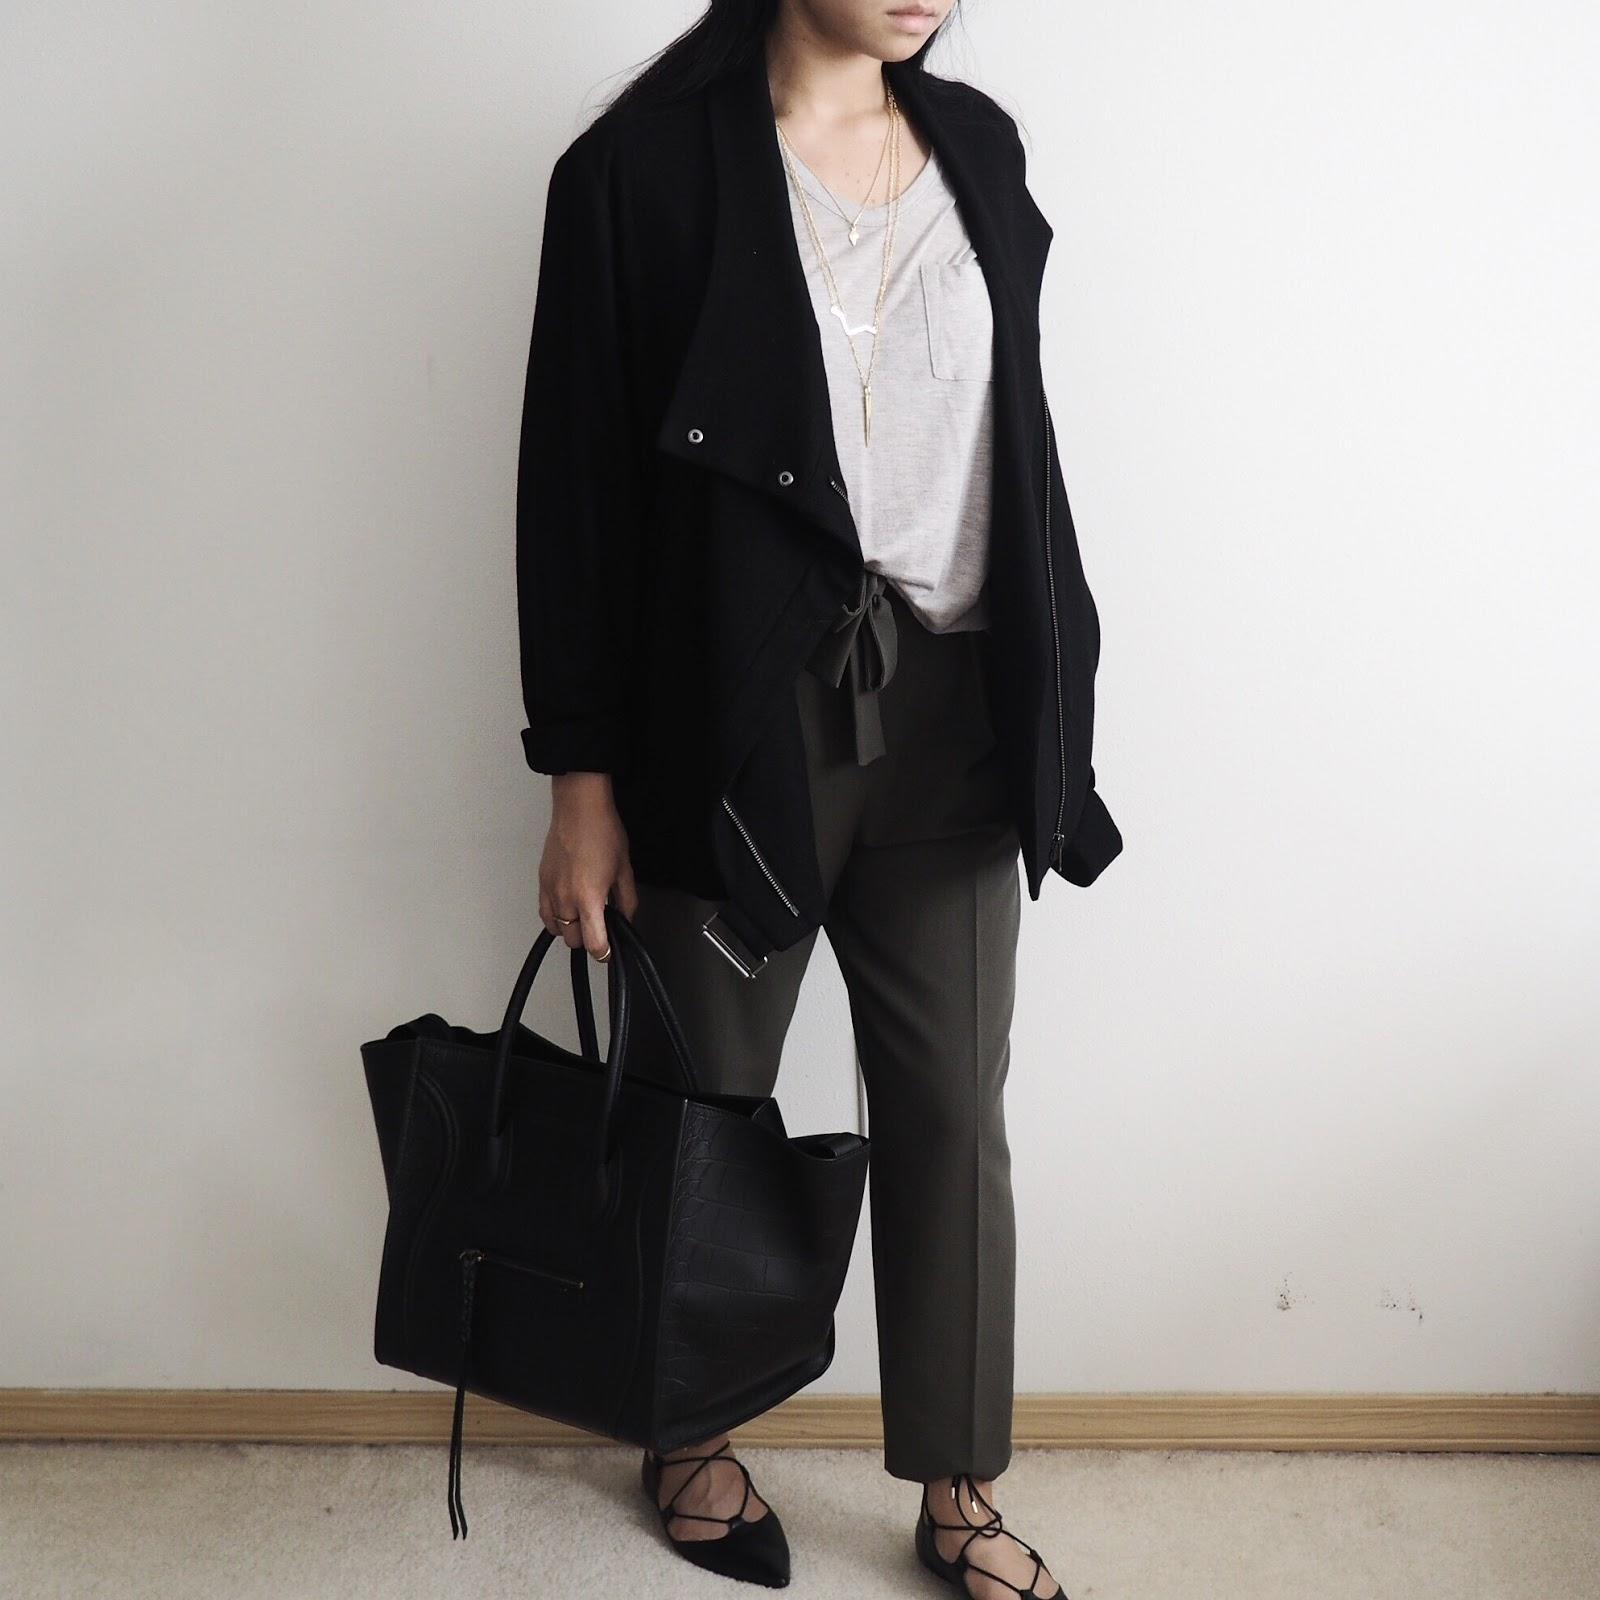 celine online bags - celine phantom croco luggage